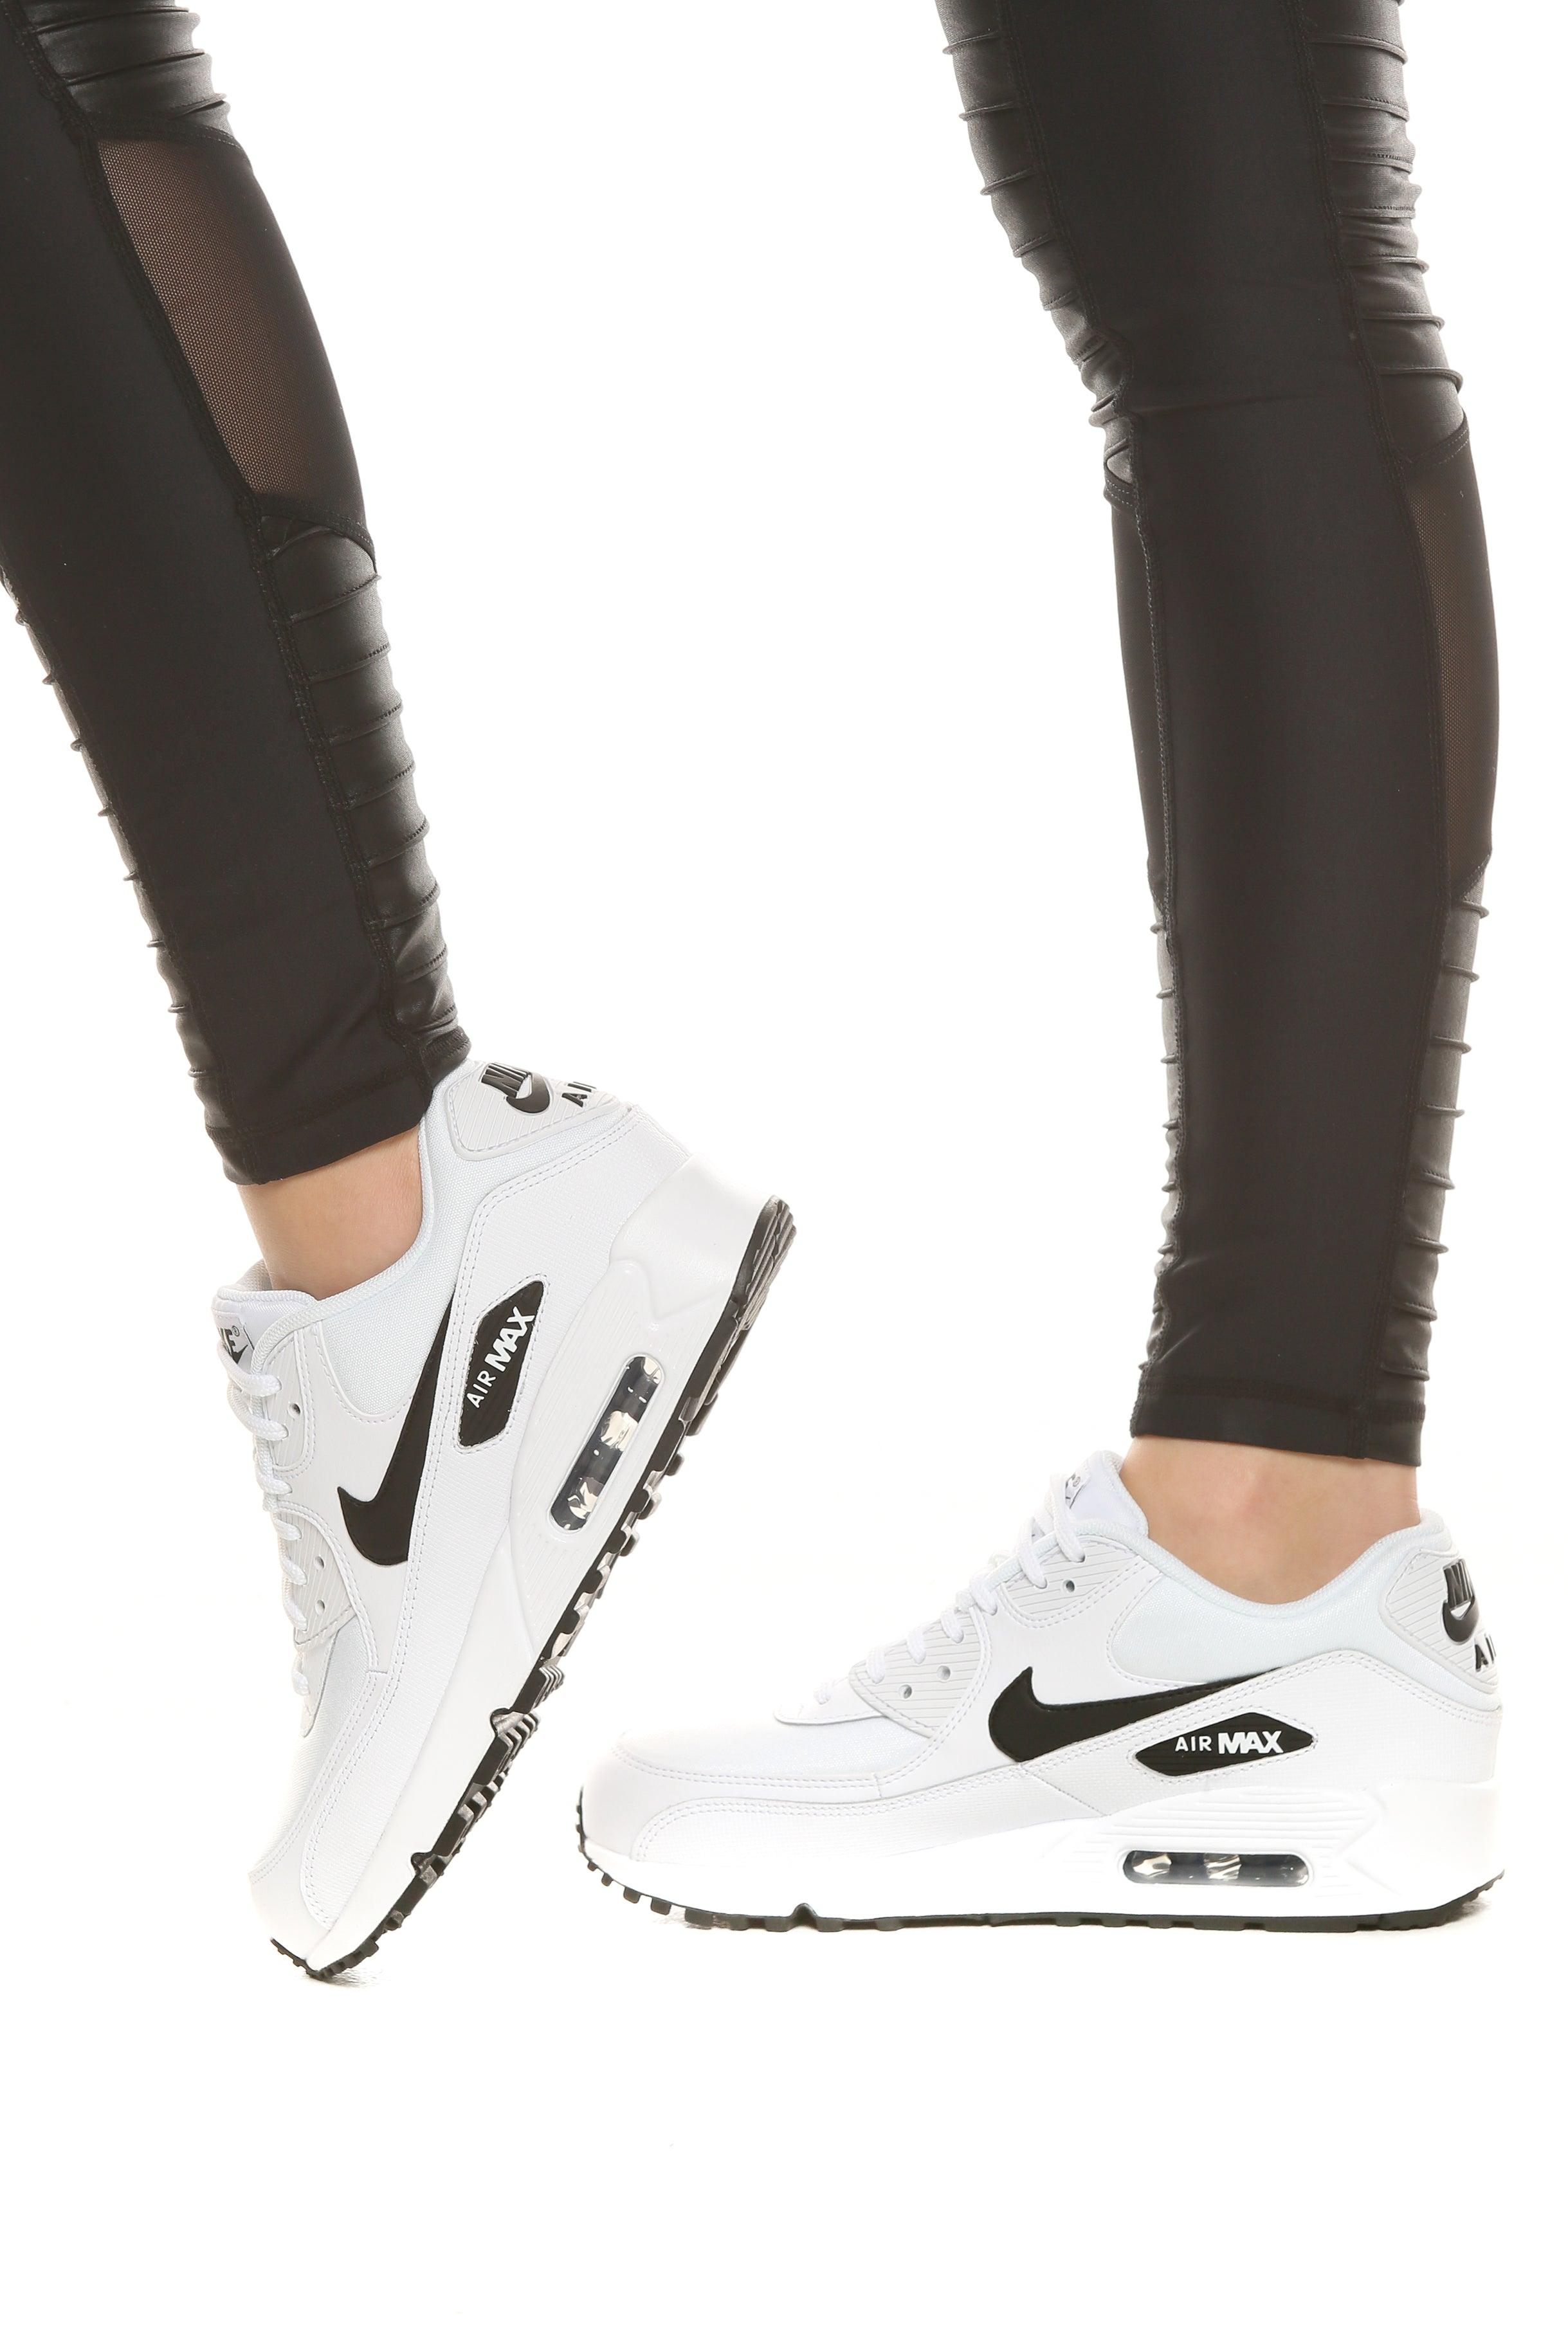 Nike Women's Air Max 90 WhiteBlack | 325213 131